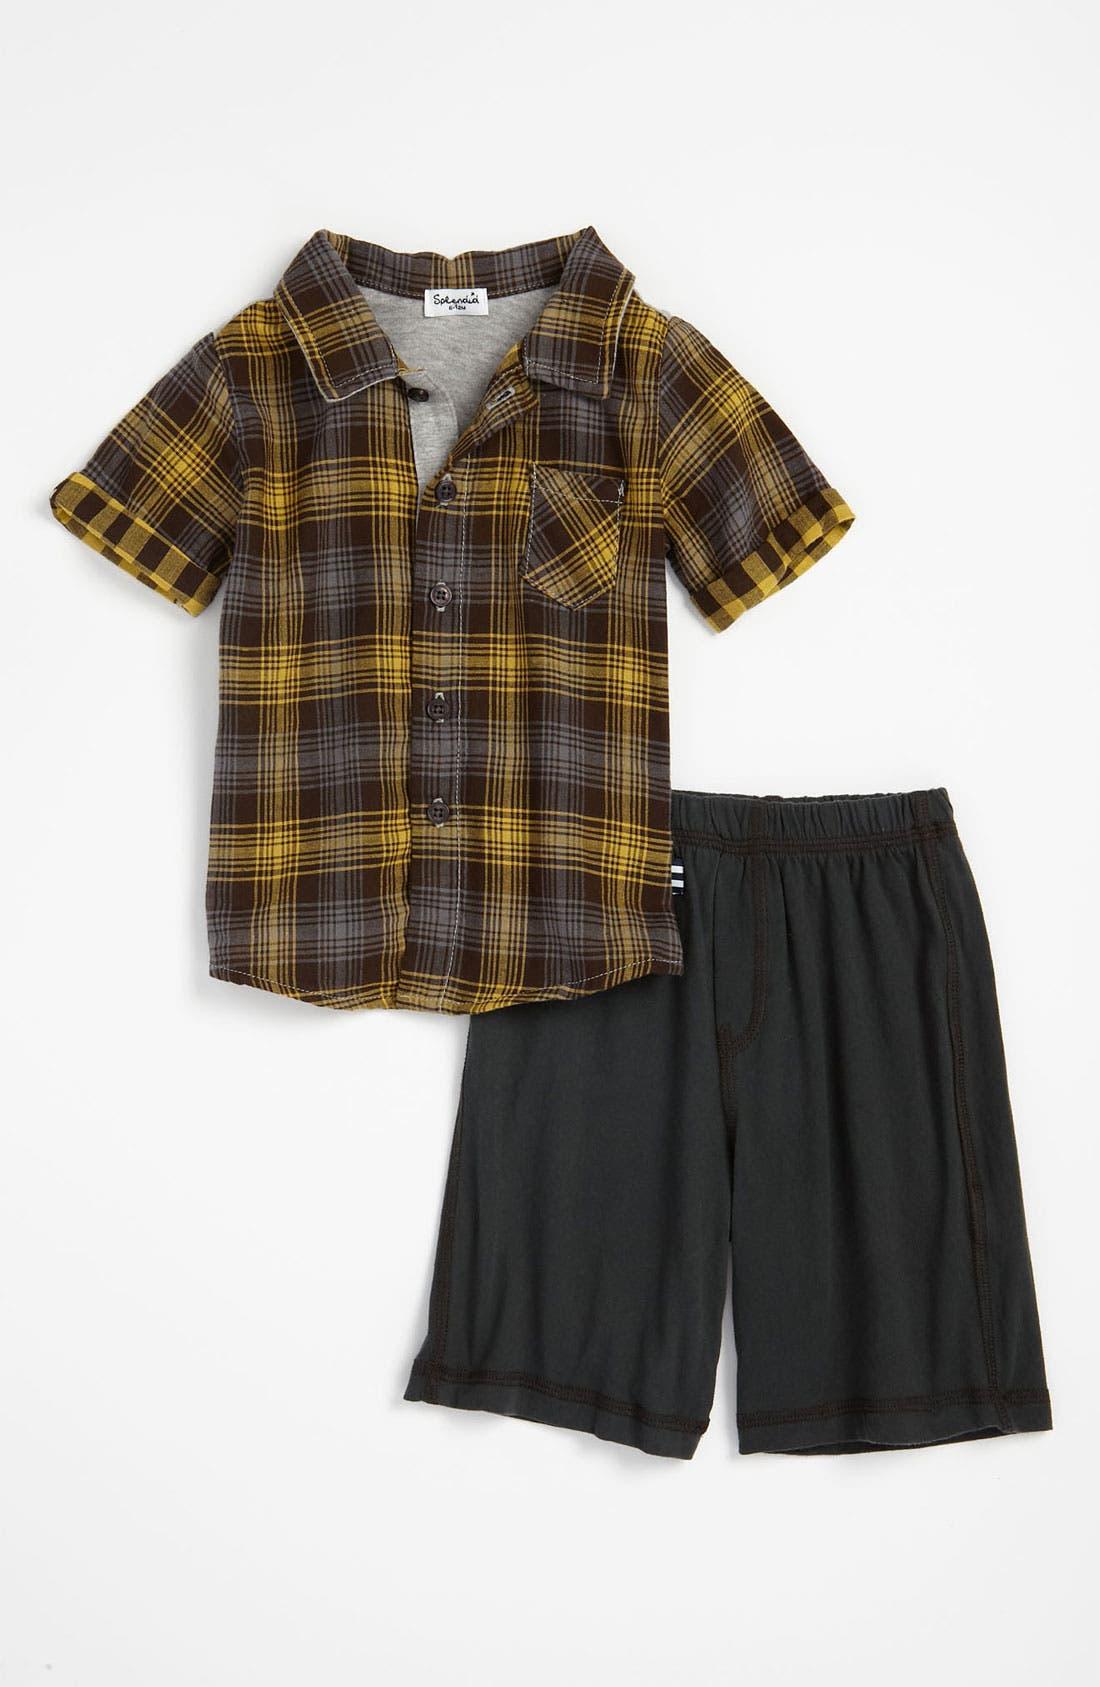 Alternate Image 1 Selected - Splendid 'Backyard' Plaid Shirt & Shorts (Infant)